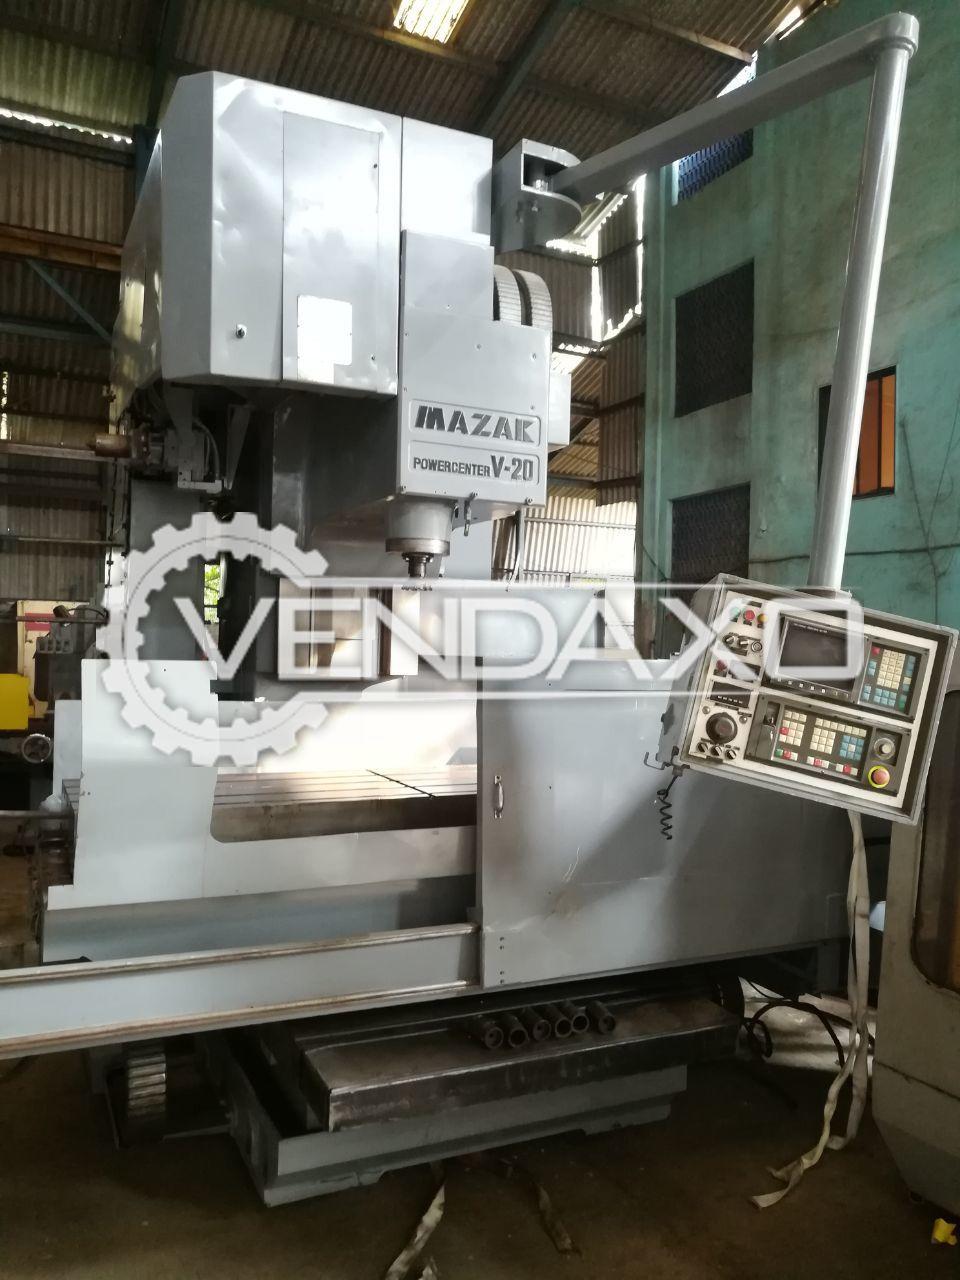 Mazak V-20 CNC Vertical Machining Center